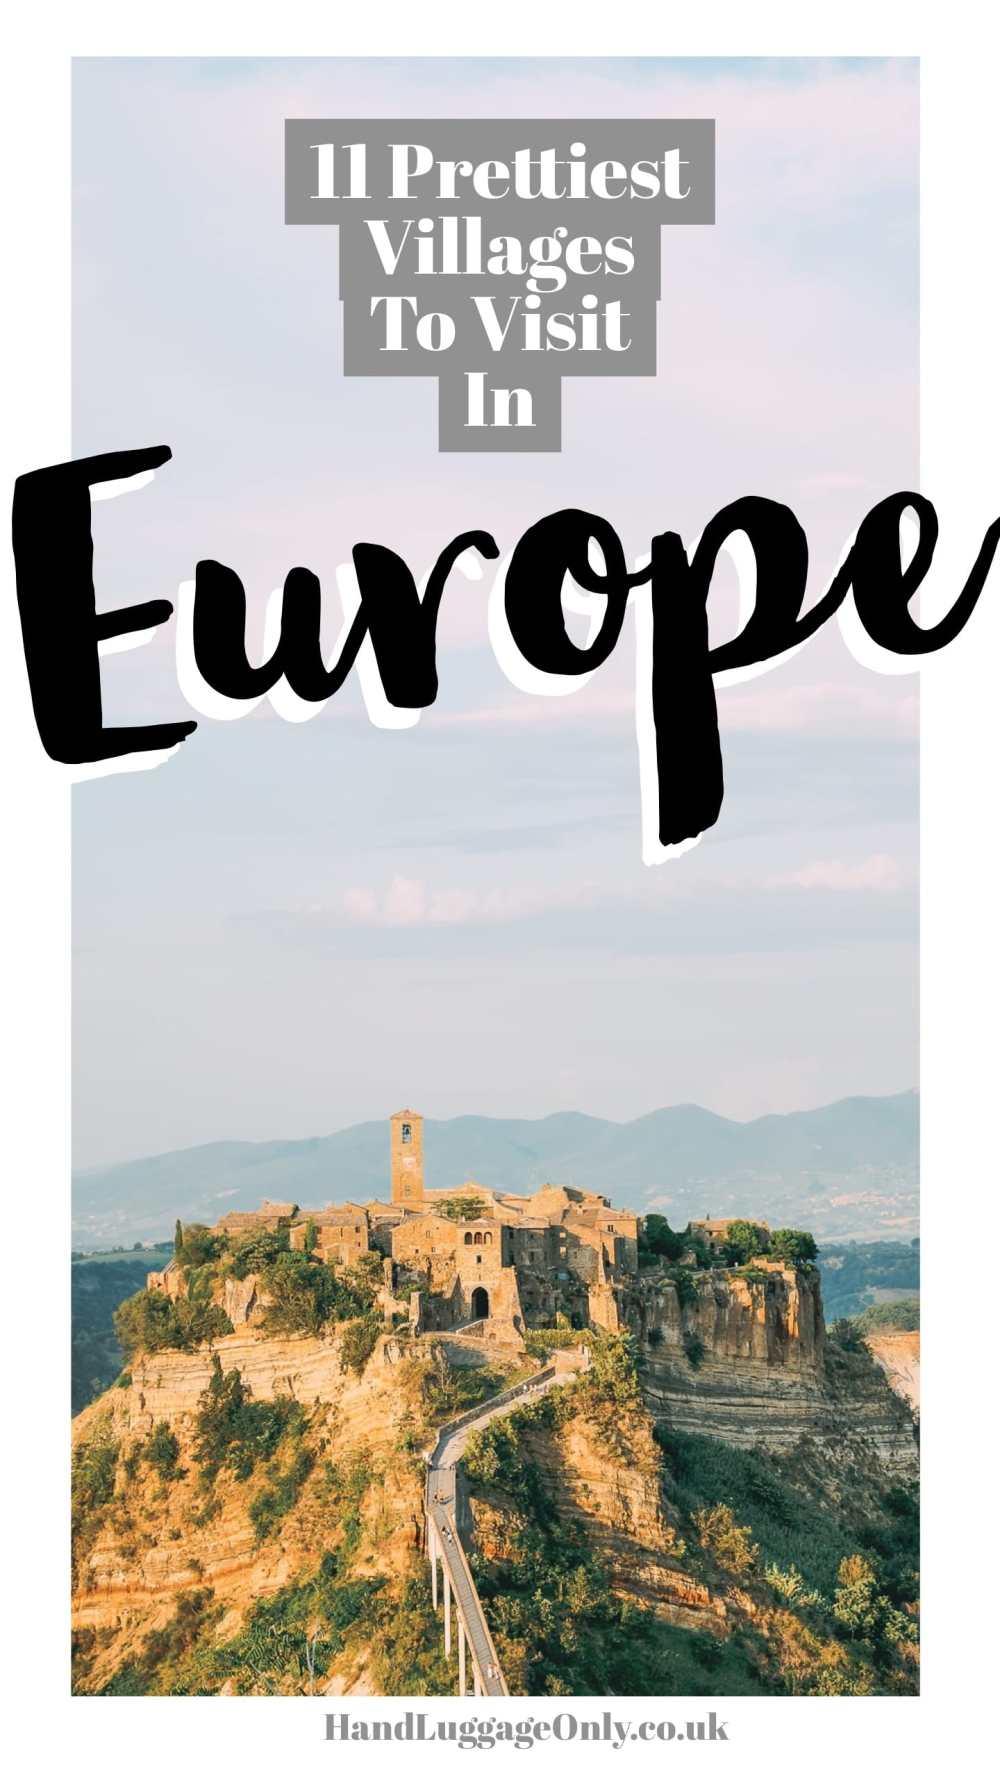 Prettiest Villages To Visit In Europe (1)